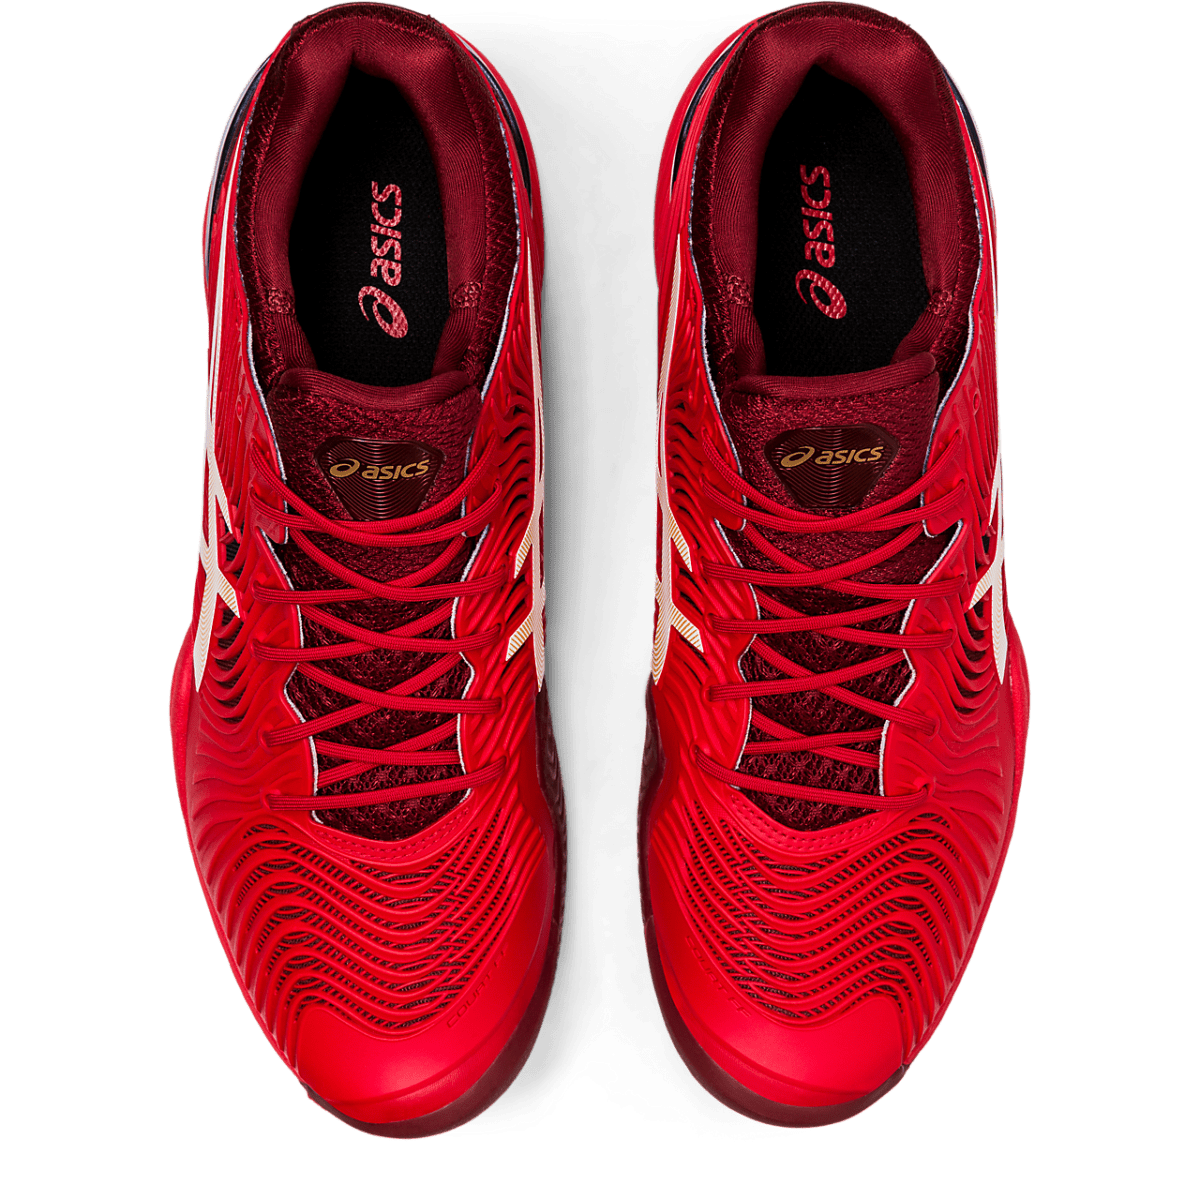 Asics Court FF 2 M 2020 (Classic Red/White)